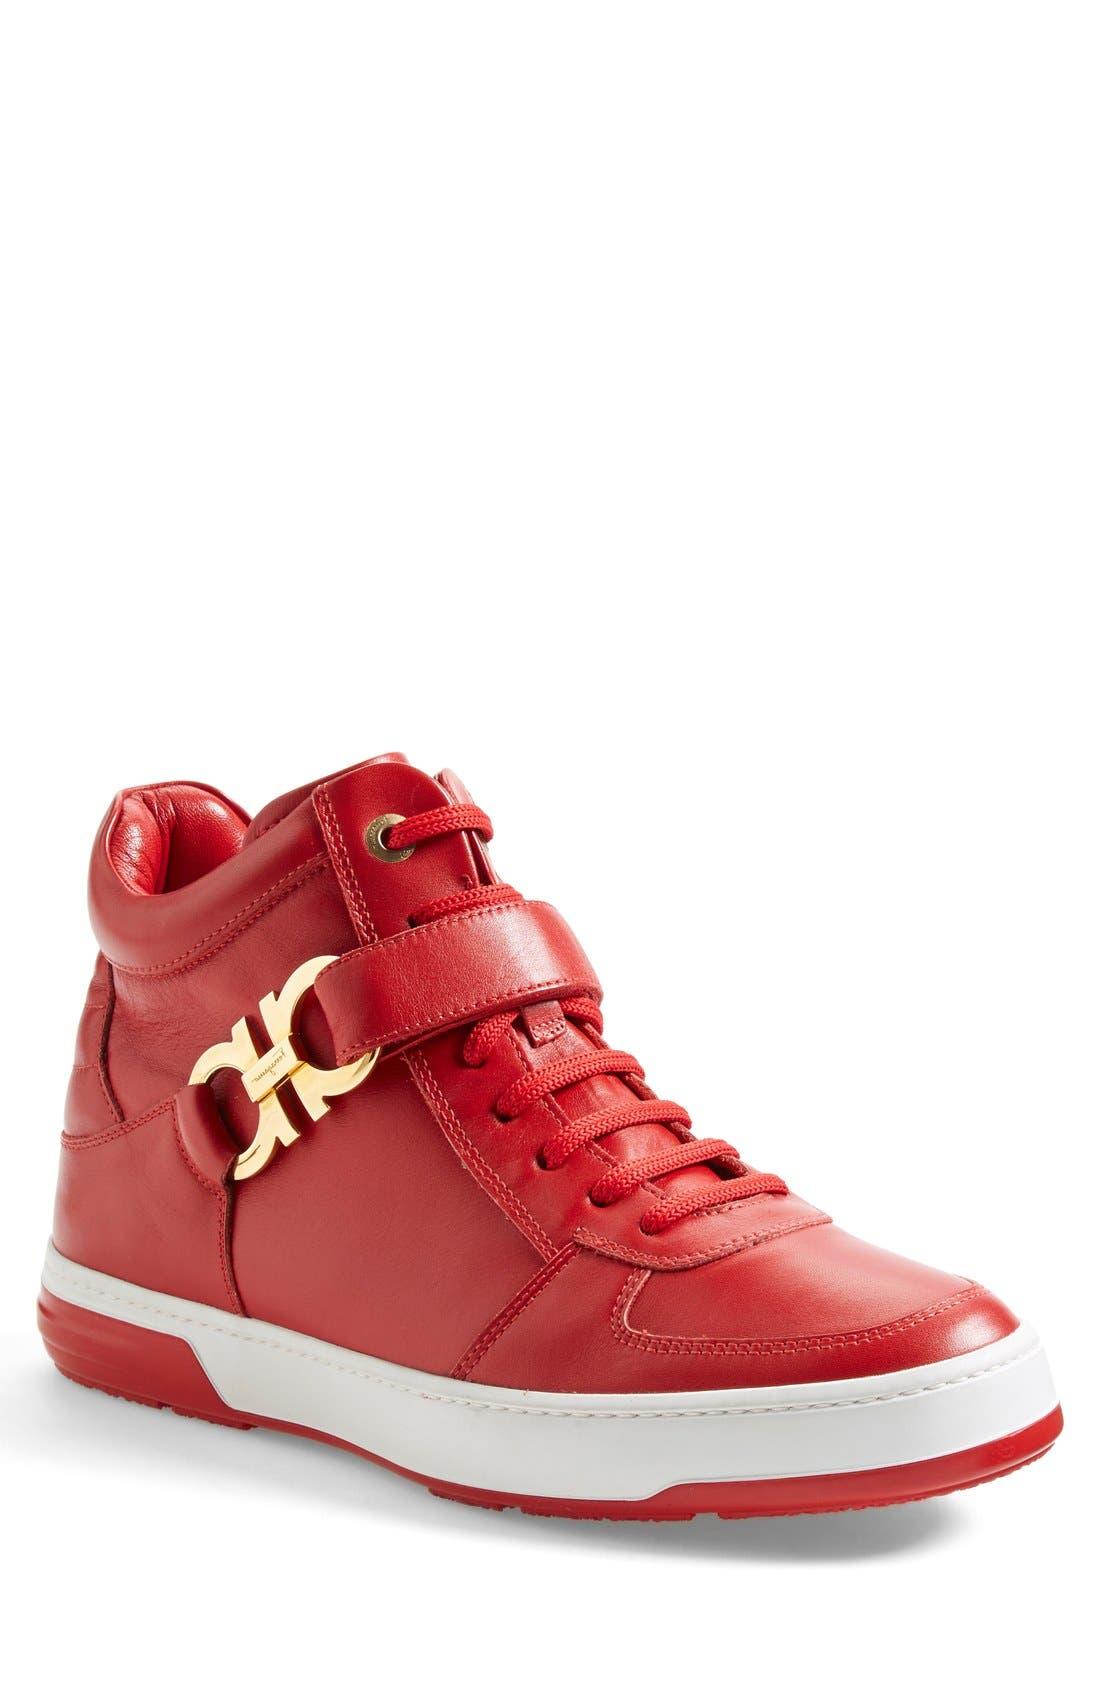 Alternate Image 1 Selected - Salvatore Ferragamo 'Nayon' High Top Sneaker (Men)